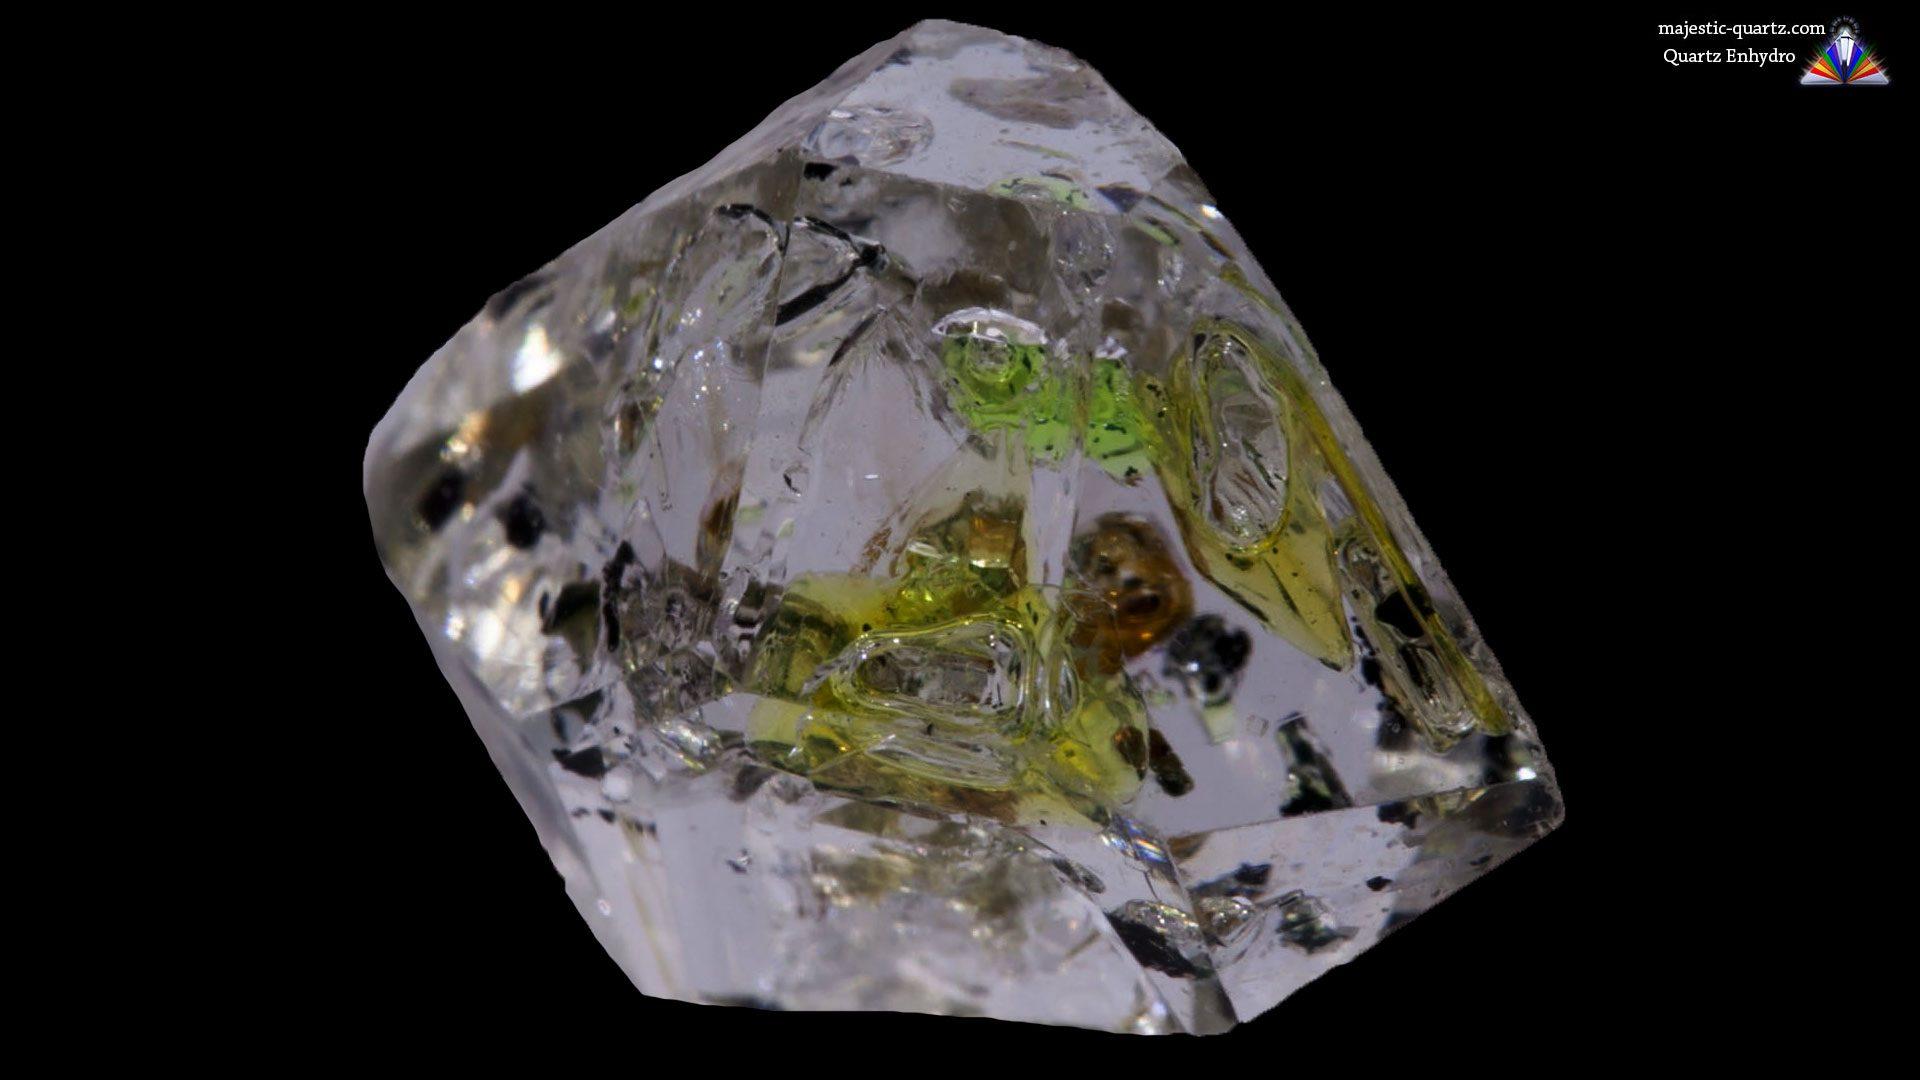 Enhydro Quartz Crystal Specimen - Original Photograph by http://spectraminerals.com